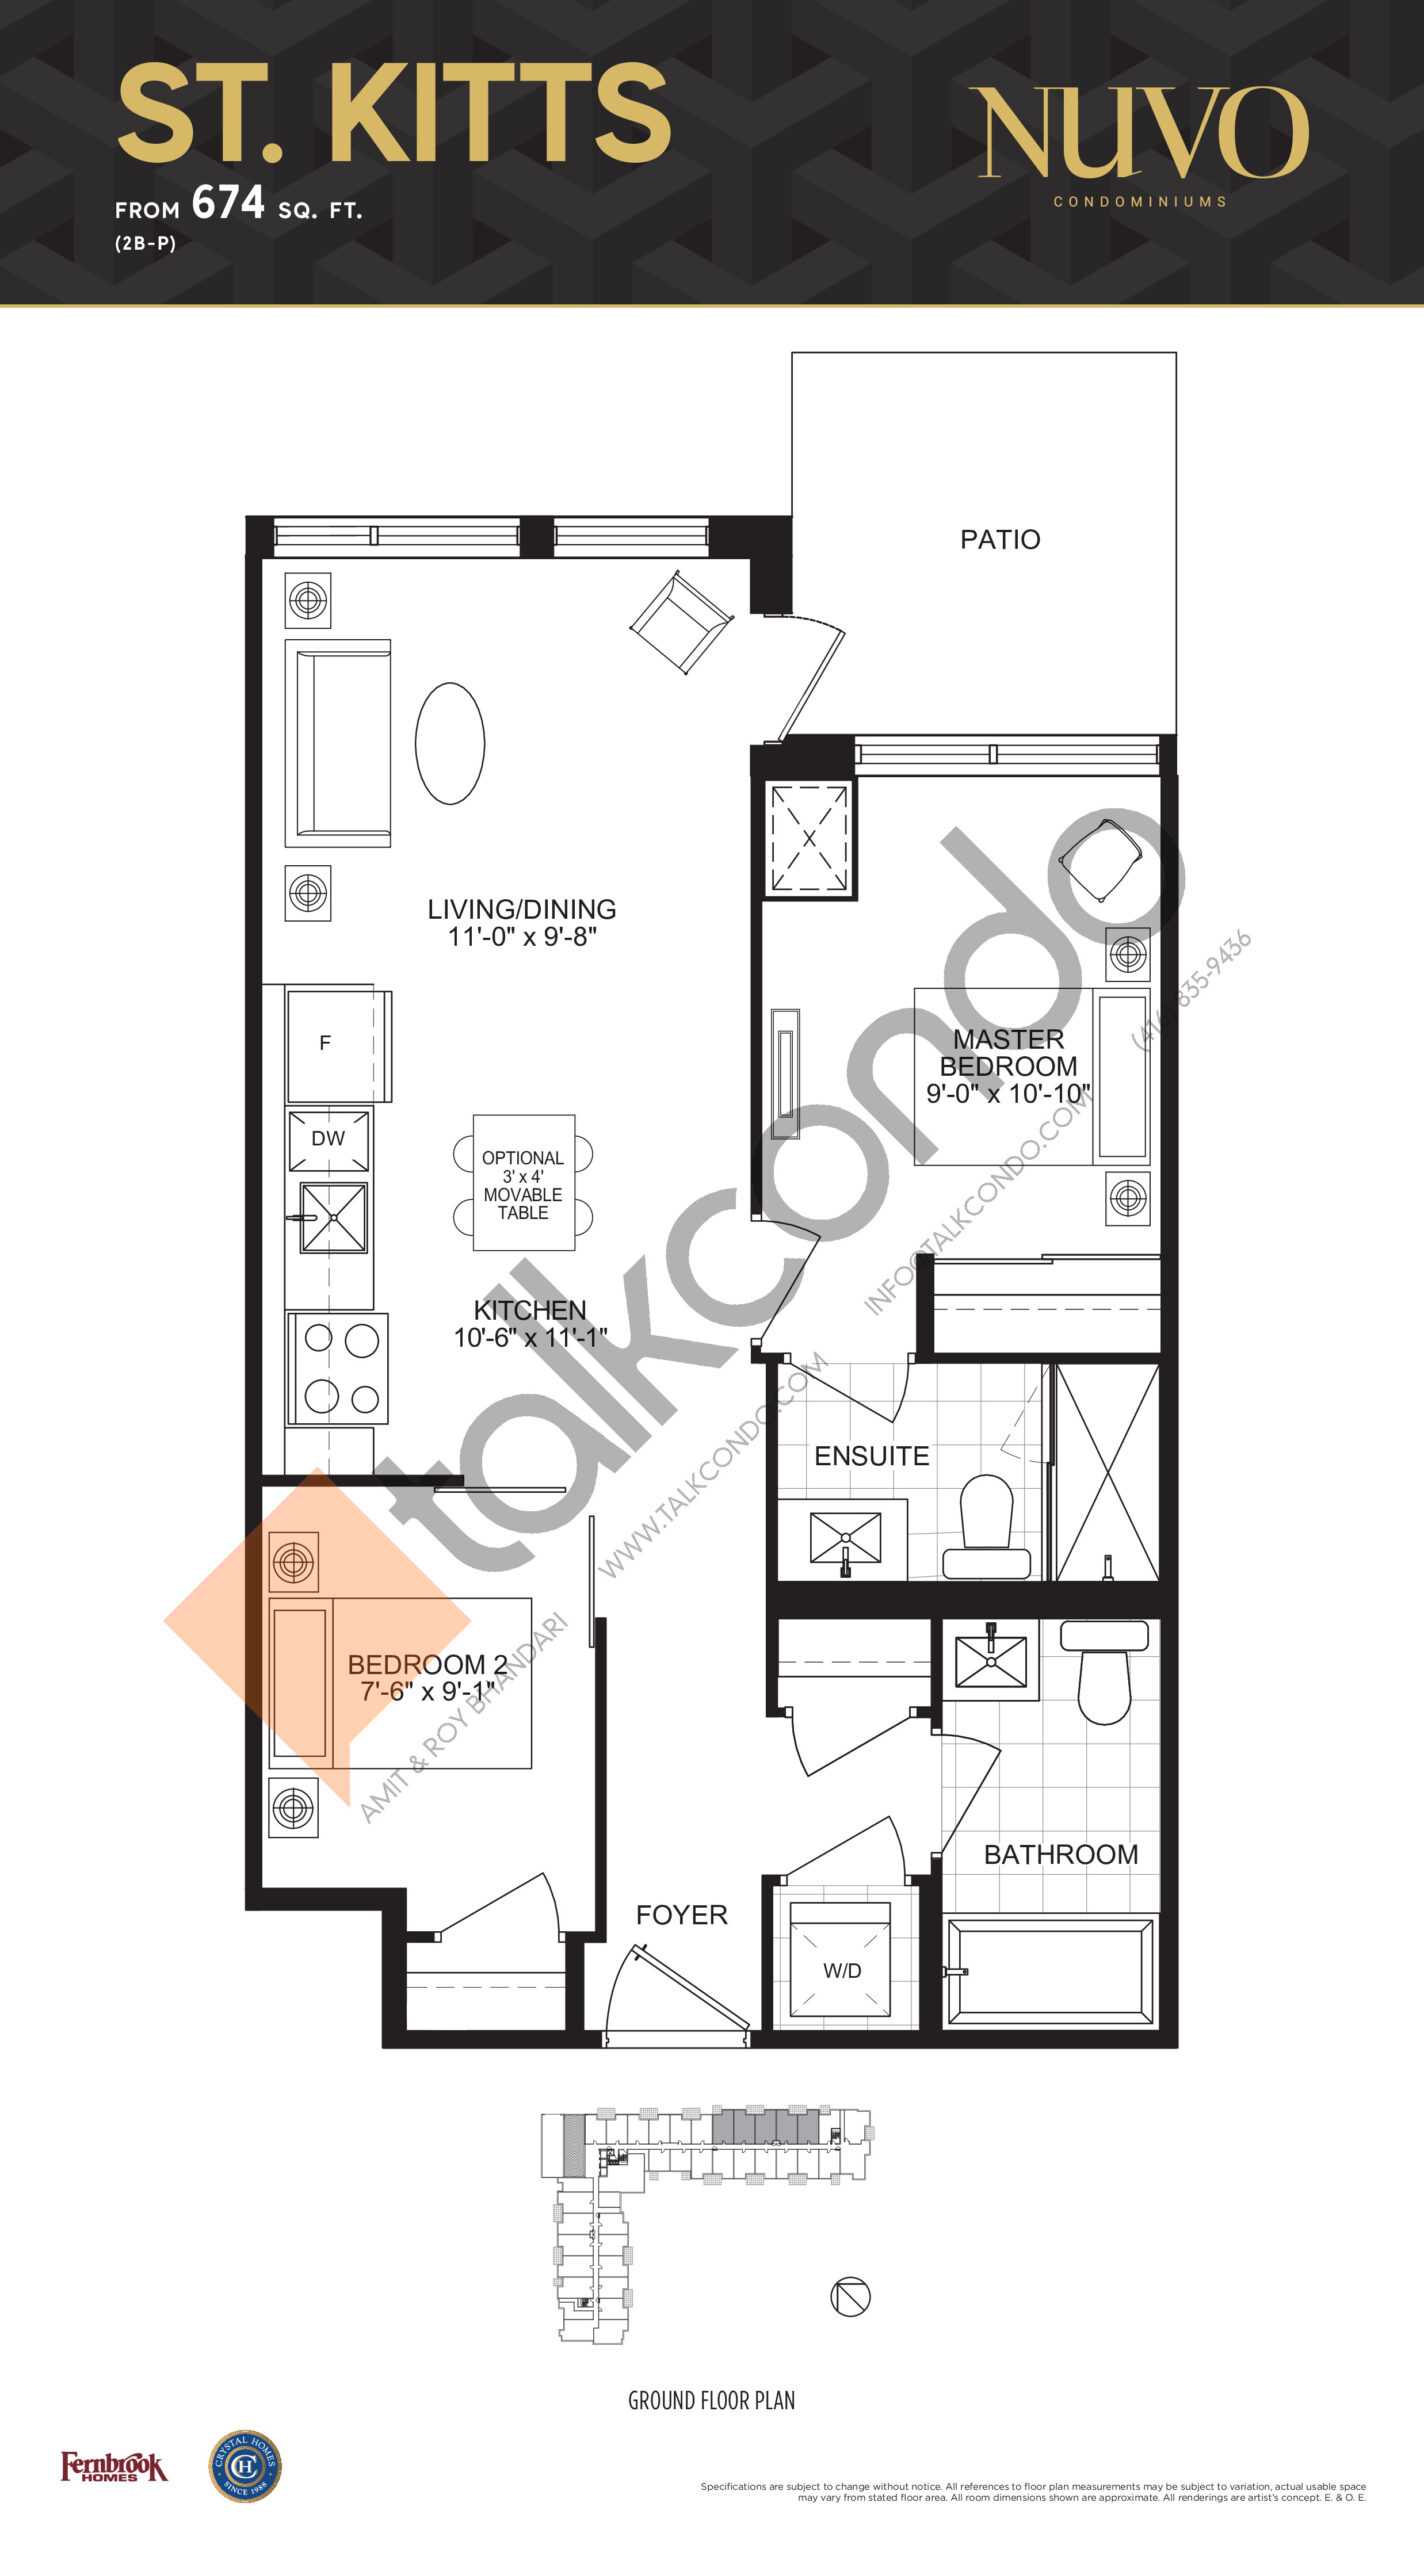 St. Kitts Floor Plan at Nuvo Condos - 674 sq.ft